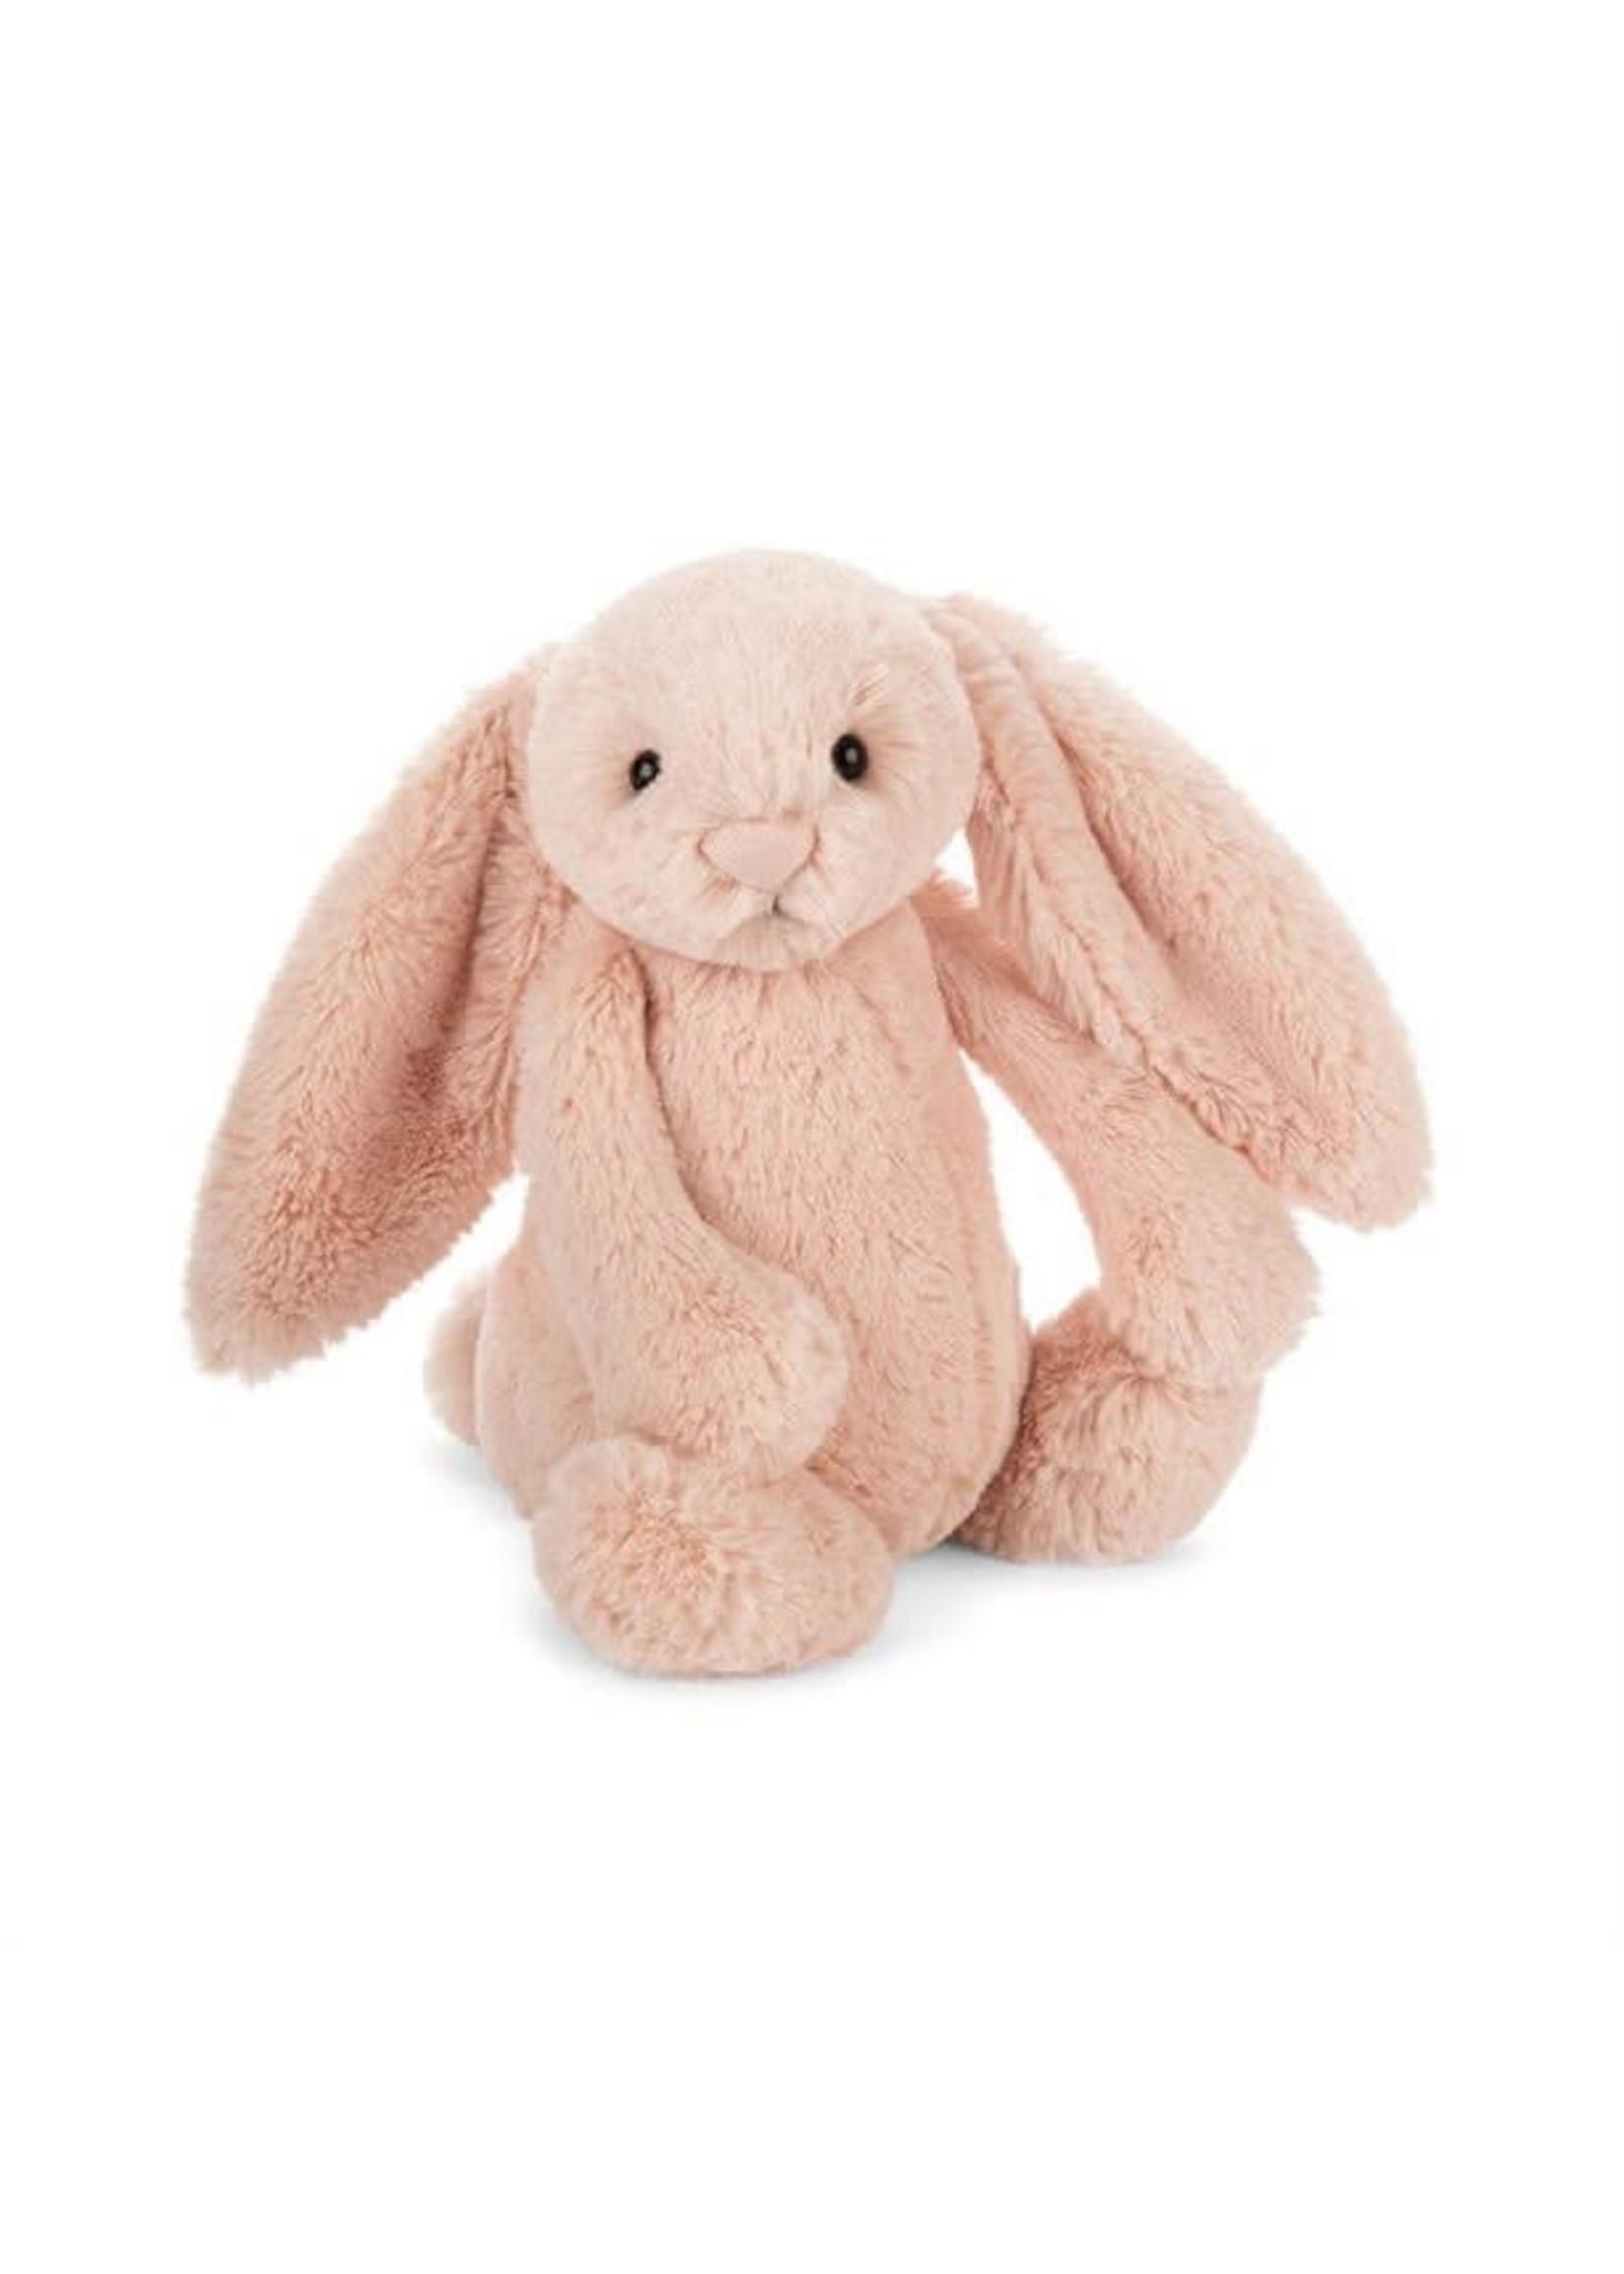 Jellycat JC Medium Bashful Blush Bunny